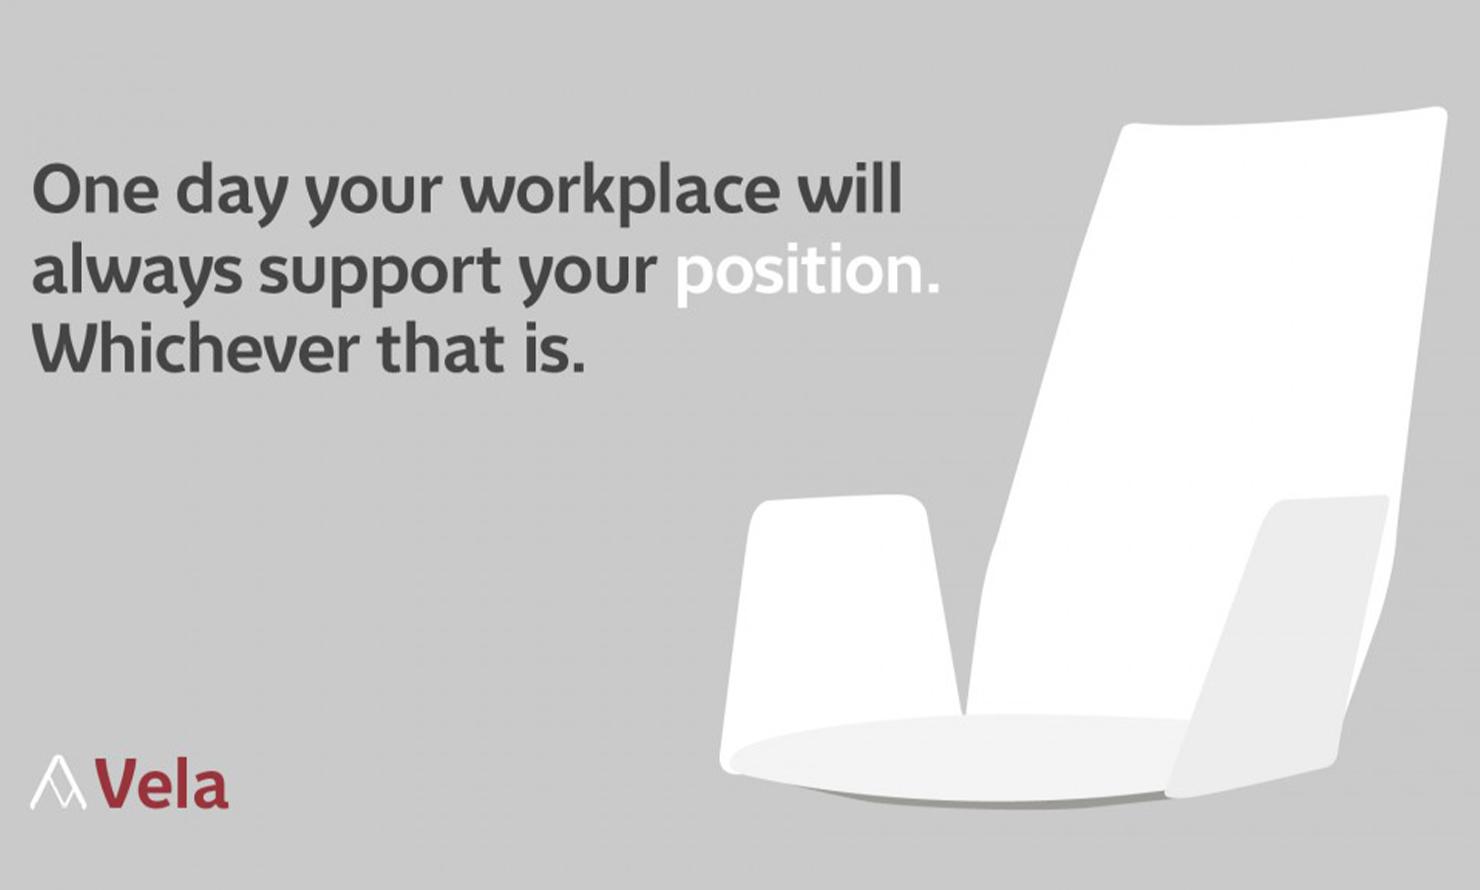 https://www.kubelibre.com/uploads/Slider-work-tutti-clienti/tecno-redesigning-the-future-of-the-future-of-work-7.jpg